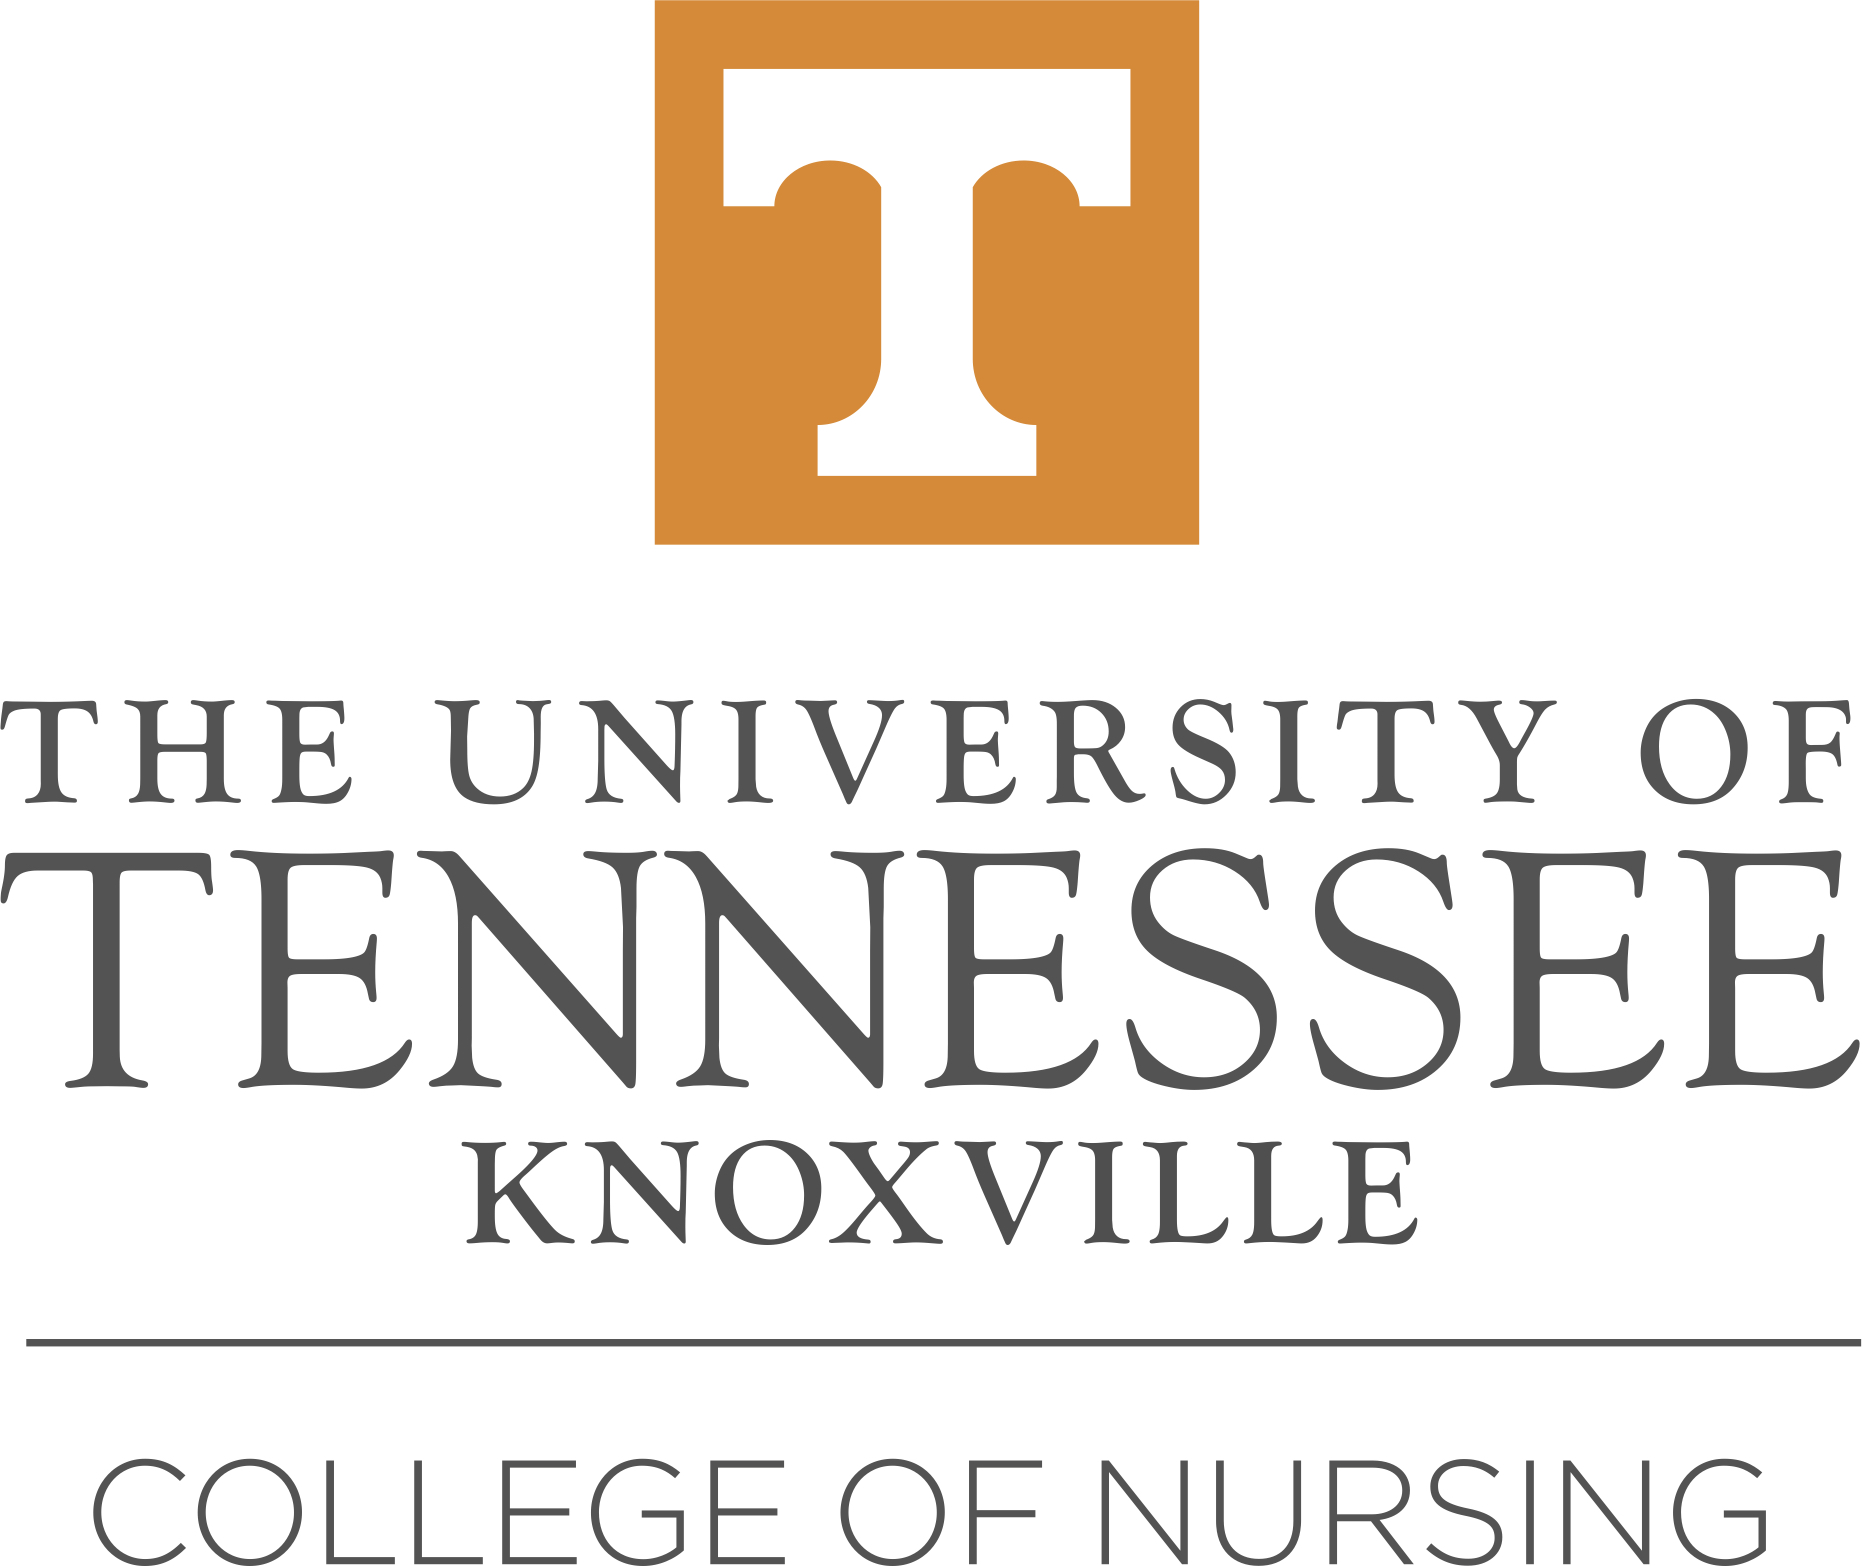 College of Nursing - CenteredLogo